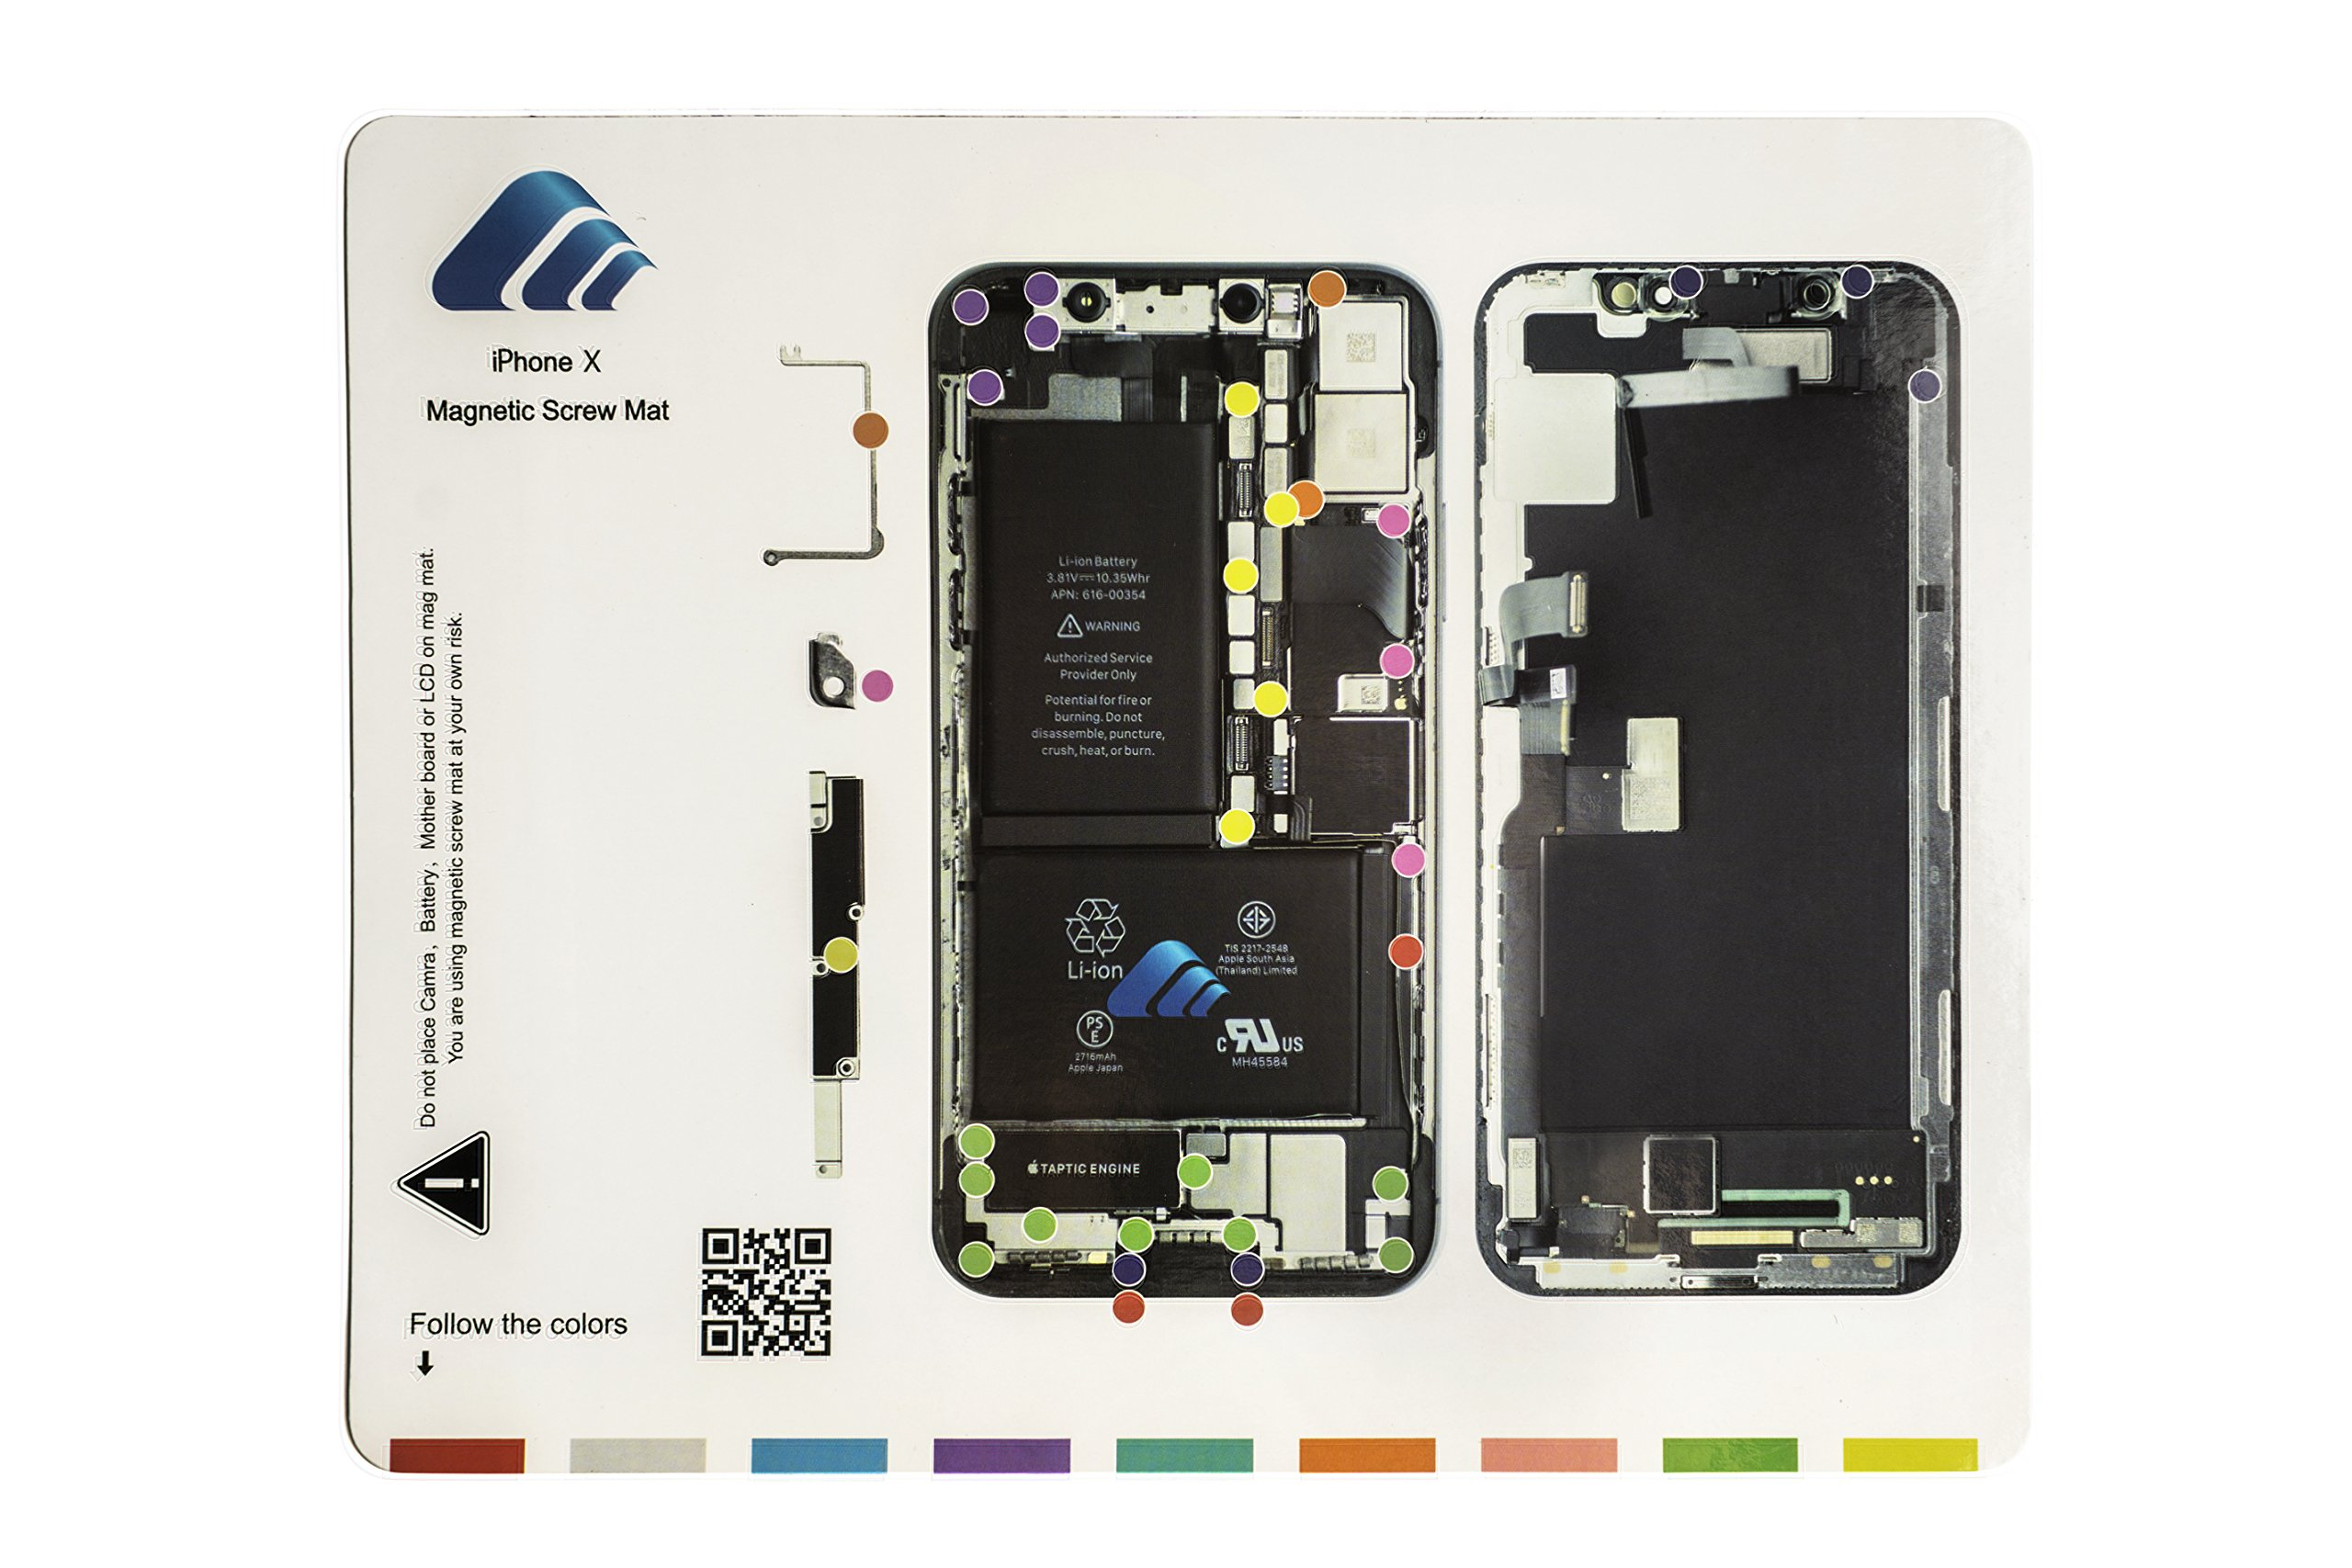 X-Sea Design Magnetic Project Mat Repair Guide Pad Screw Keeper Chart Map Professional Guide Pad Repair Tools (for iPhone X)